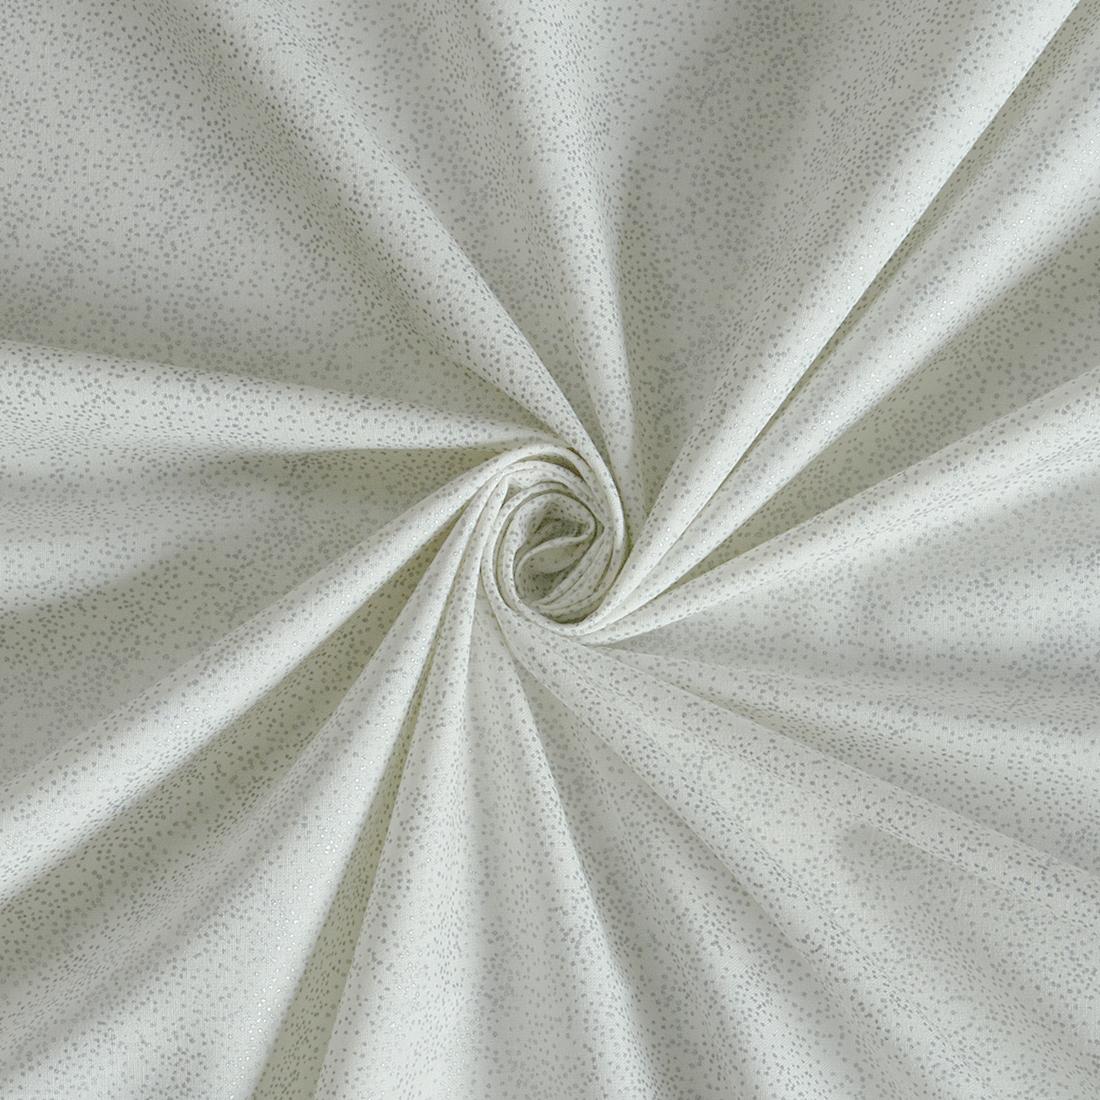 Spaced Glitter Foil White Silver